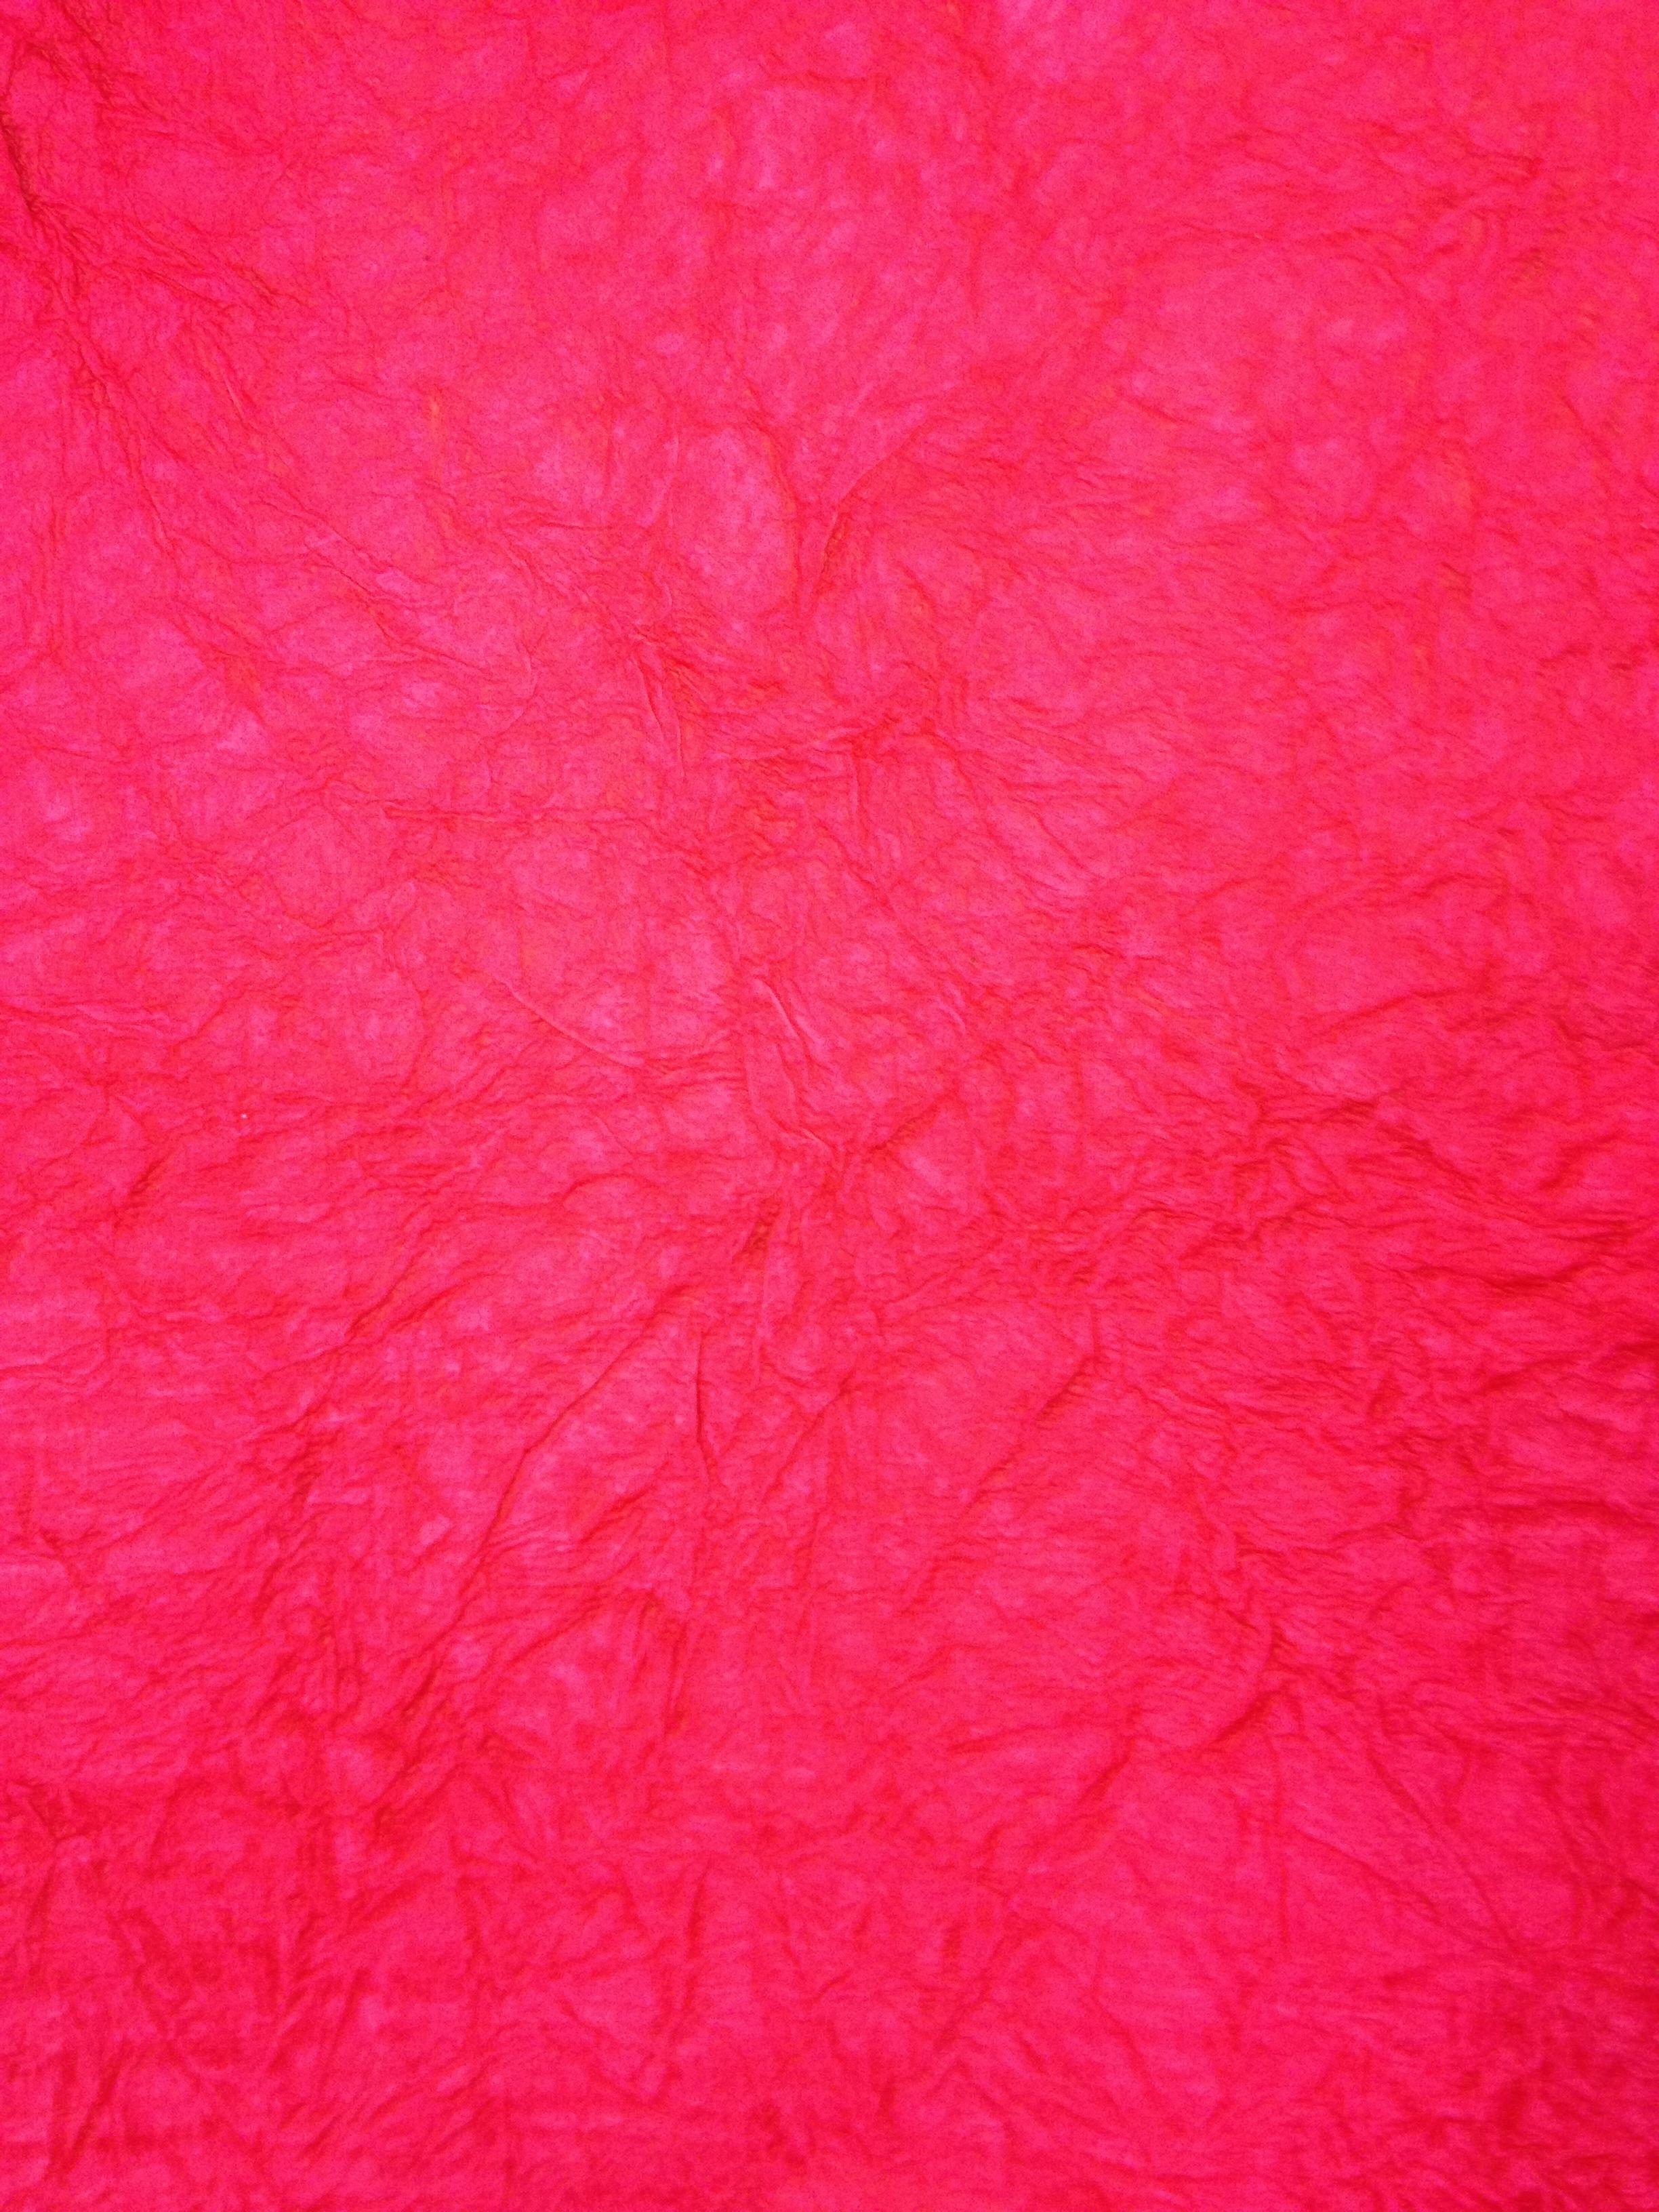 pink, wrinkled, solid Wallpaper, 3d wallpaper, Iphone 5